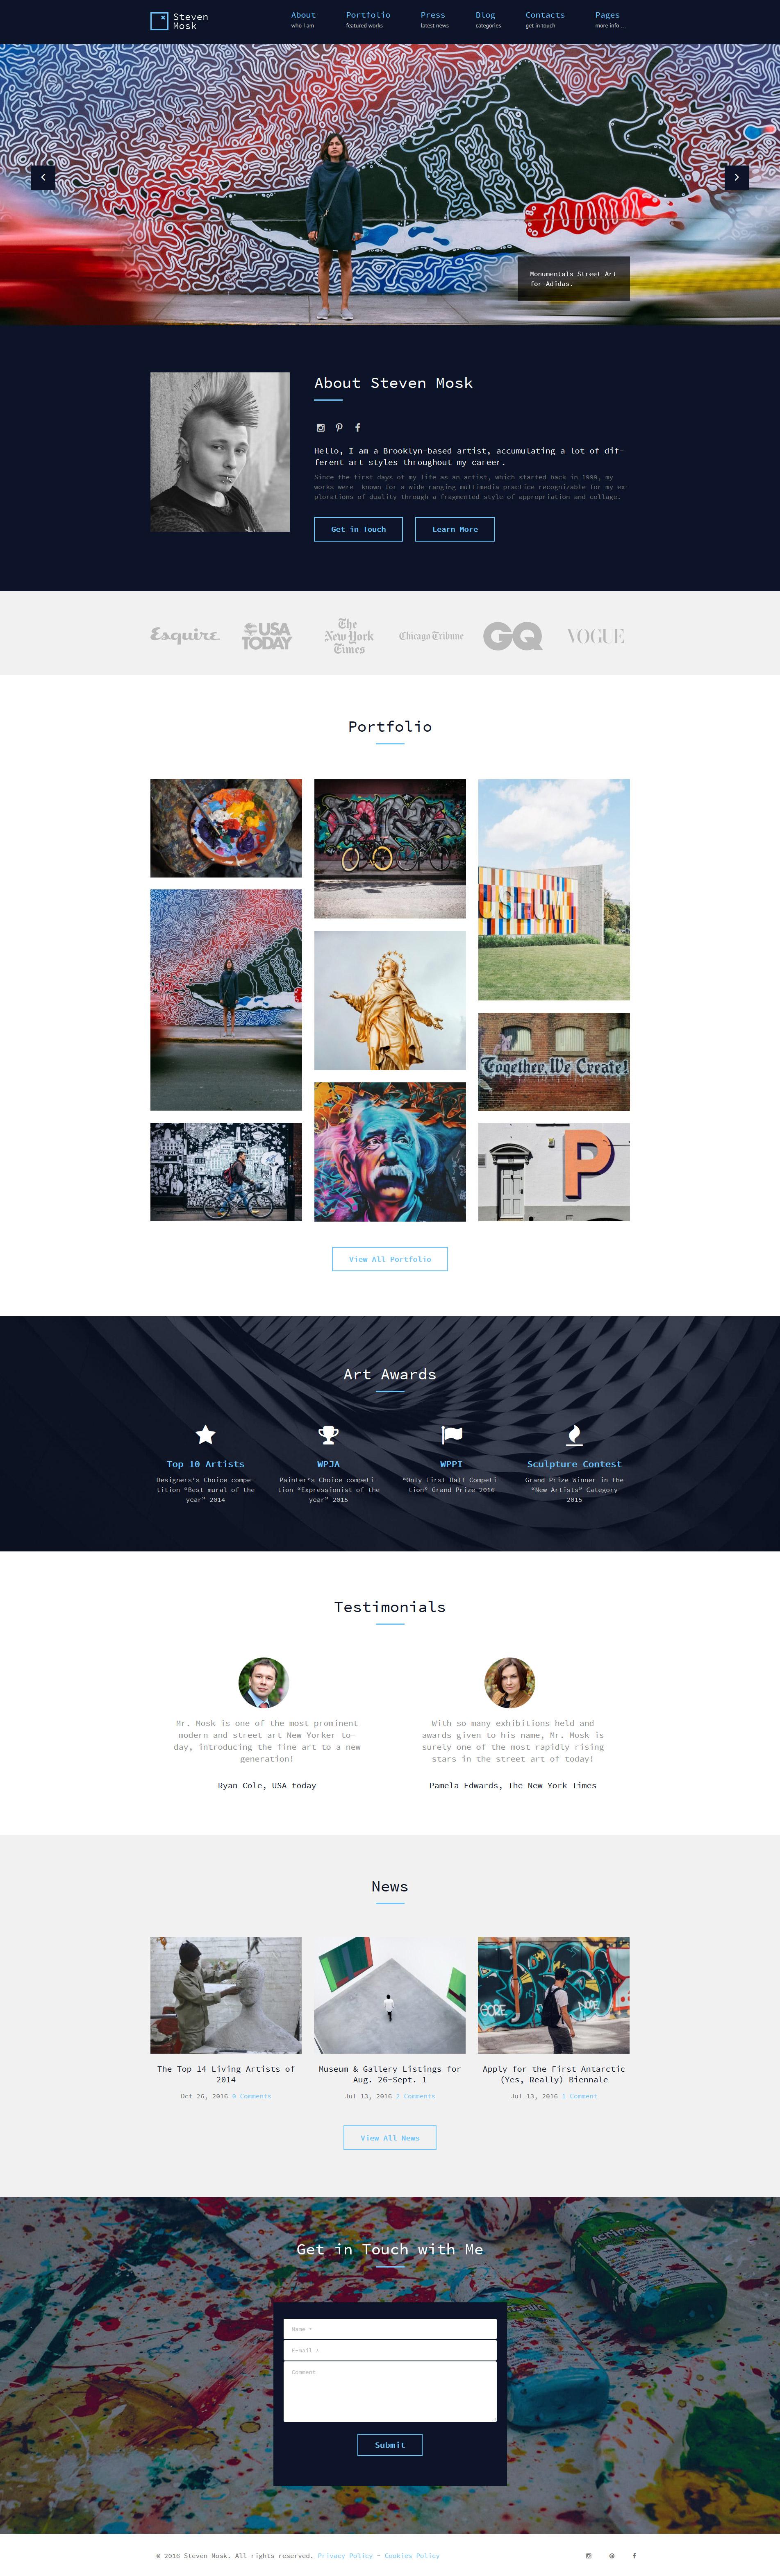 Steven Mosk - Modern artist personal portfolio №61116 - скриншот